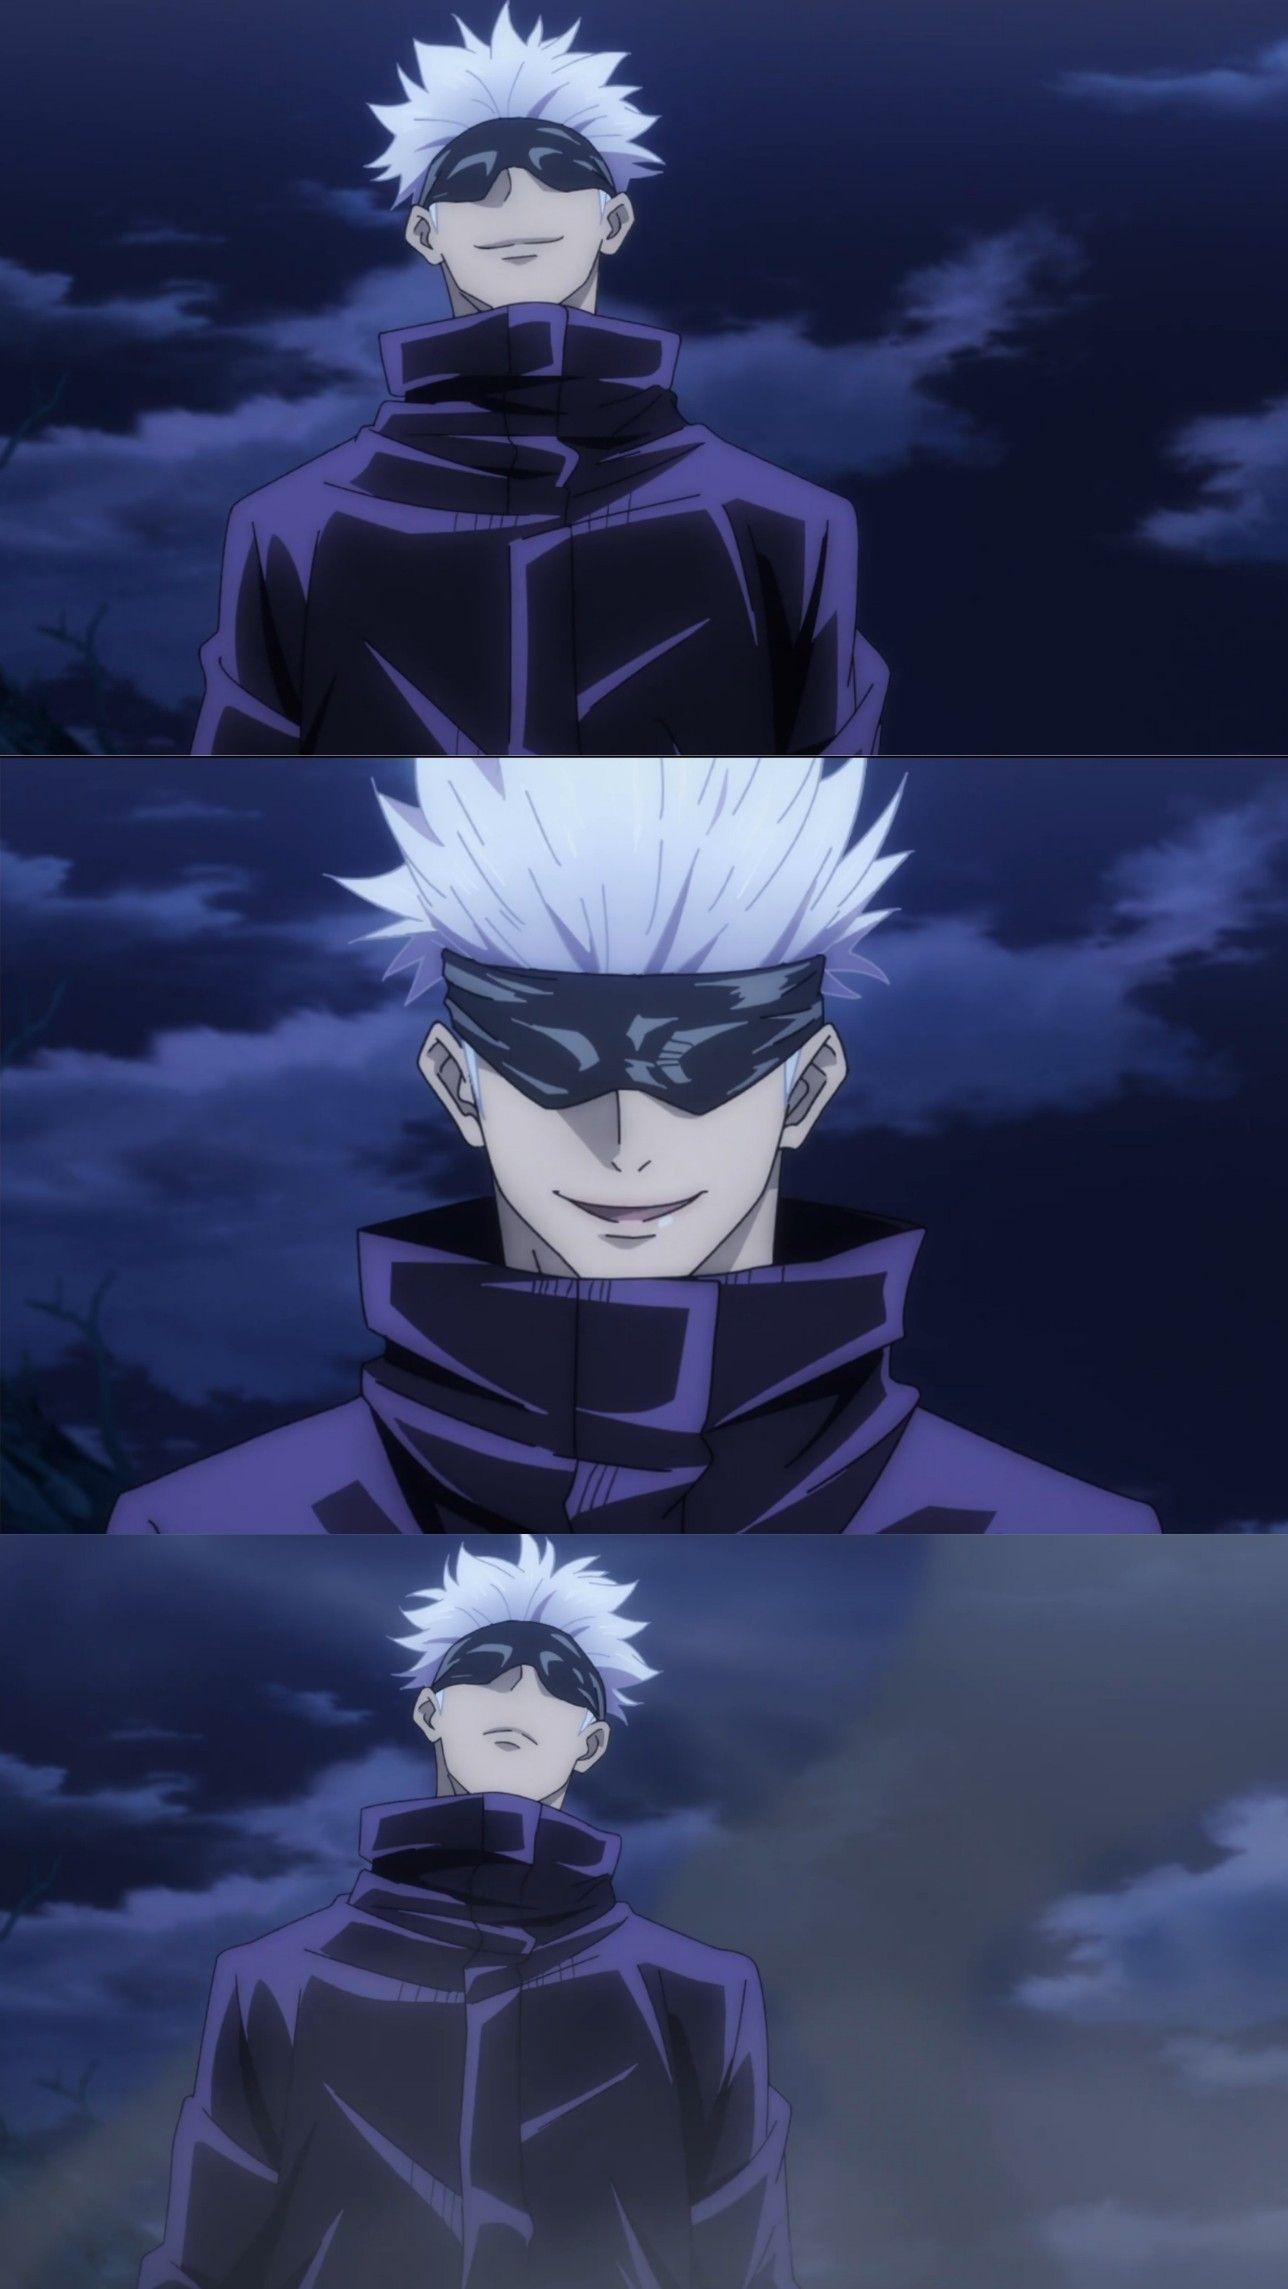 Gojo Satoru Jujutsu Anime Anime Characters